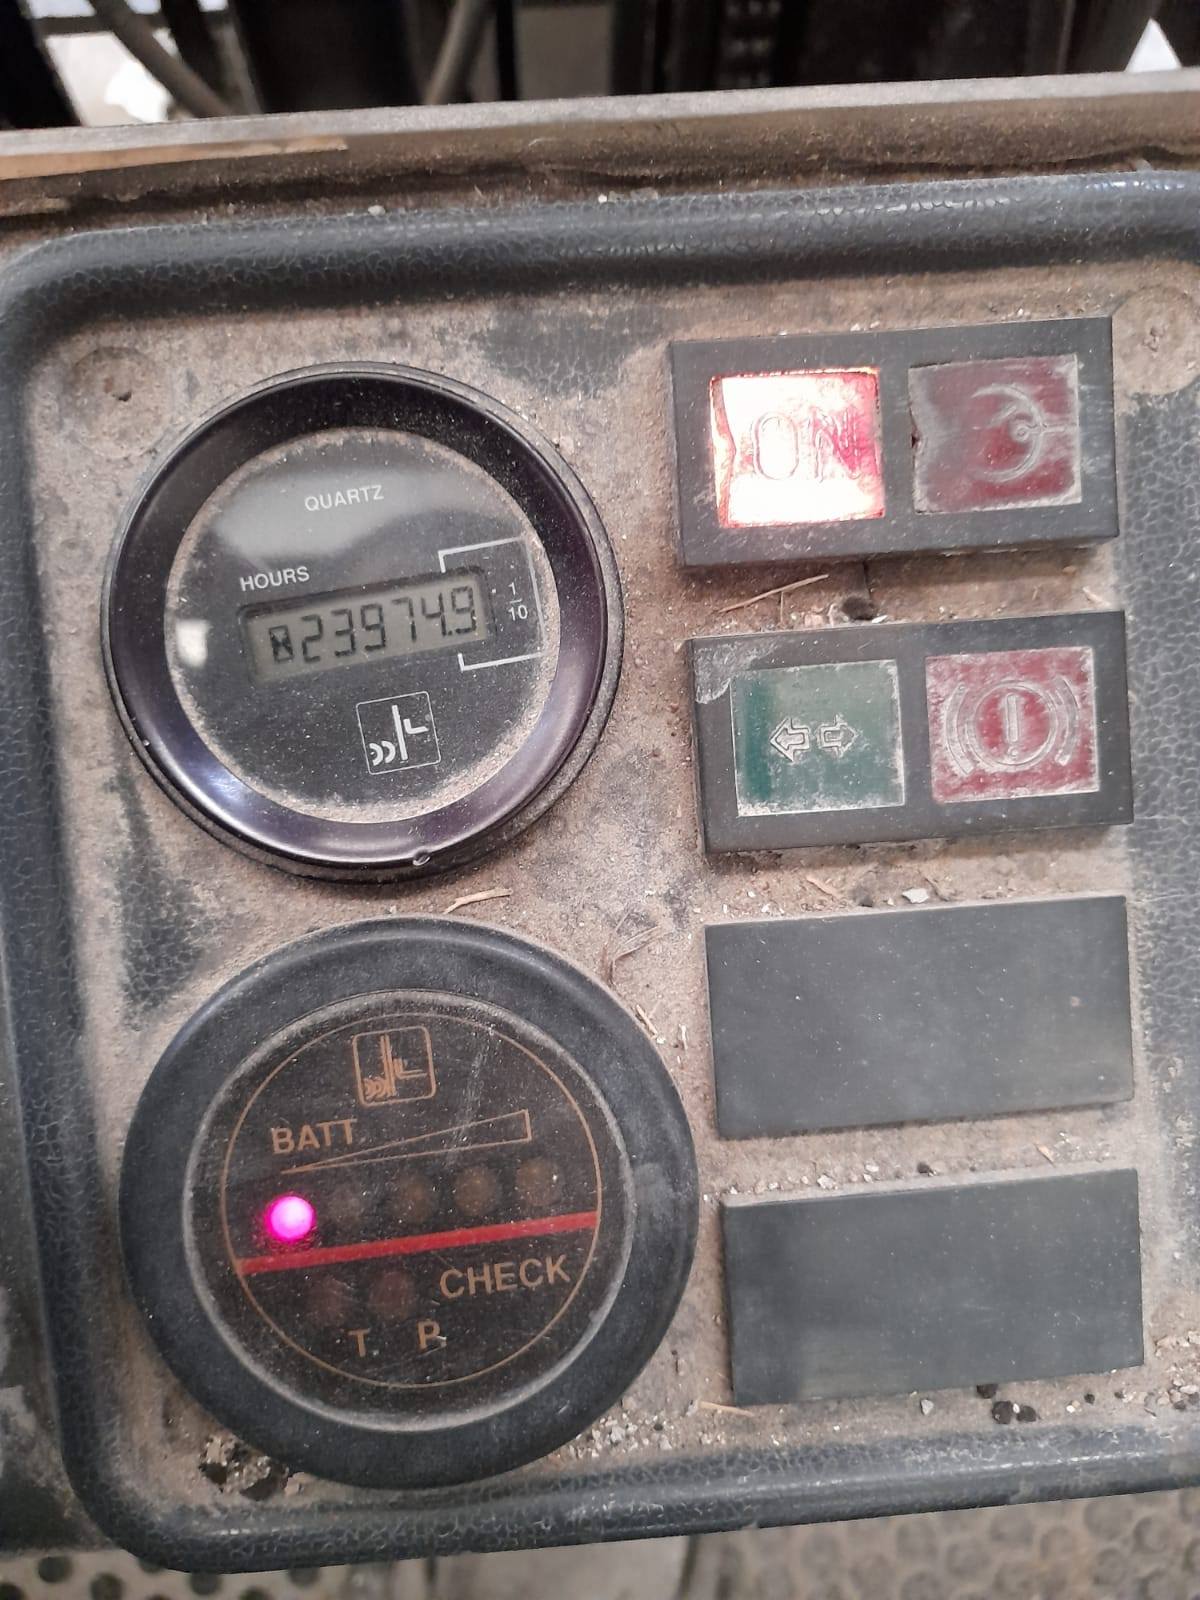 Carrello elevatore OM E 15 N in vendita - foto 5